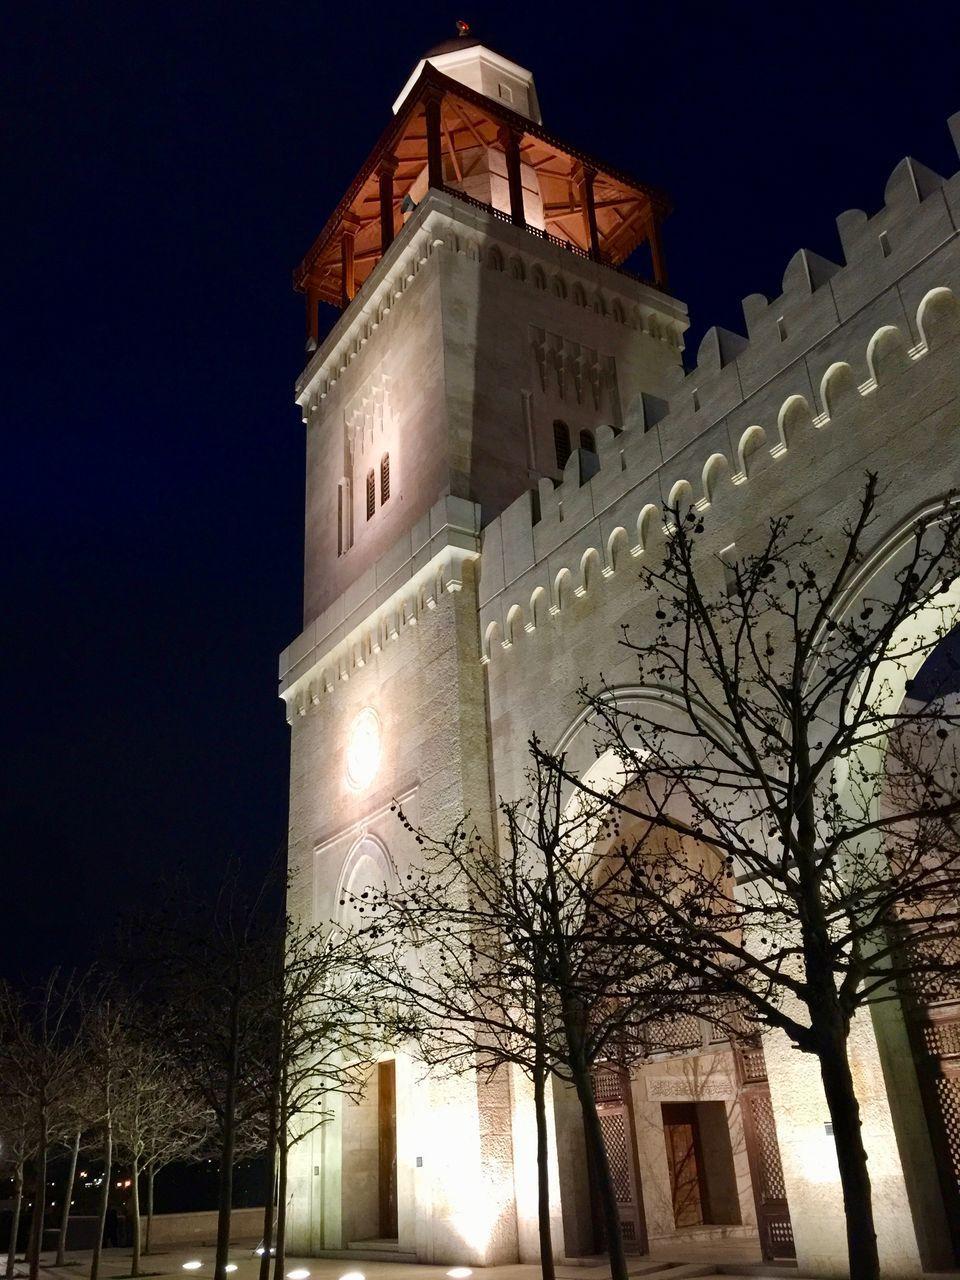 LOW ANGLE VIEW OF ILLUMINATED CHURCH AT NIGHT